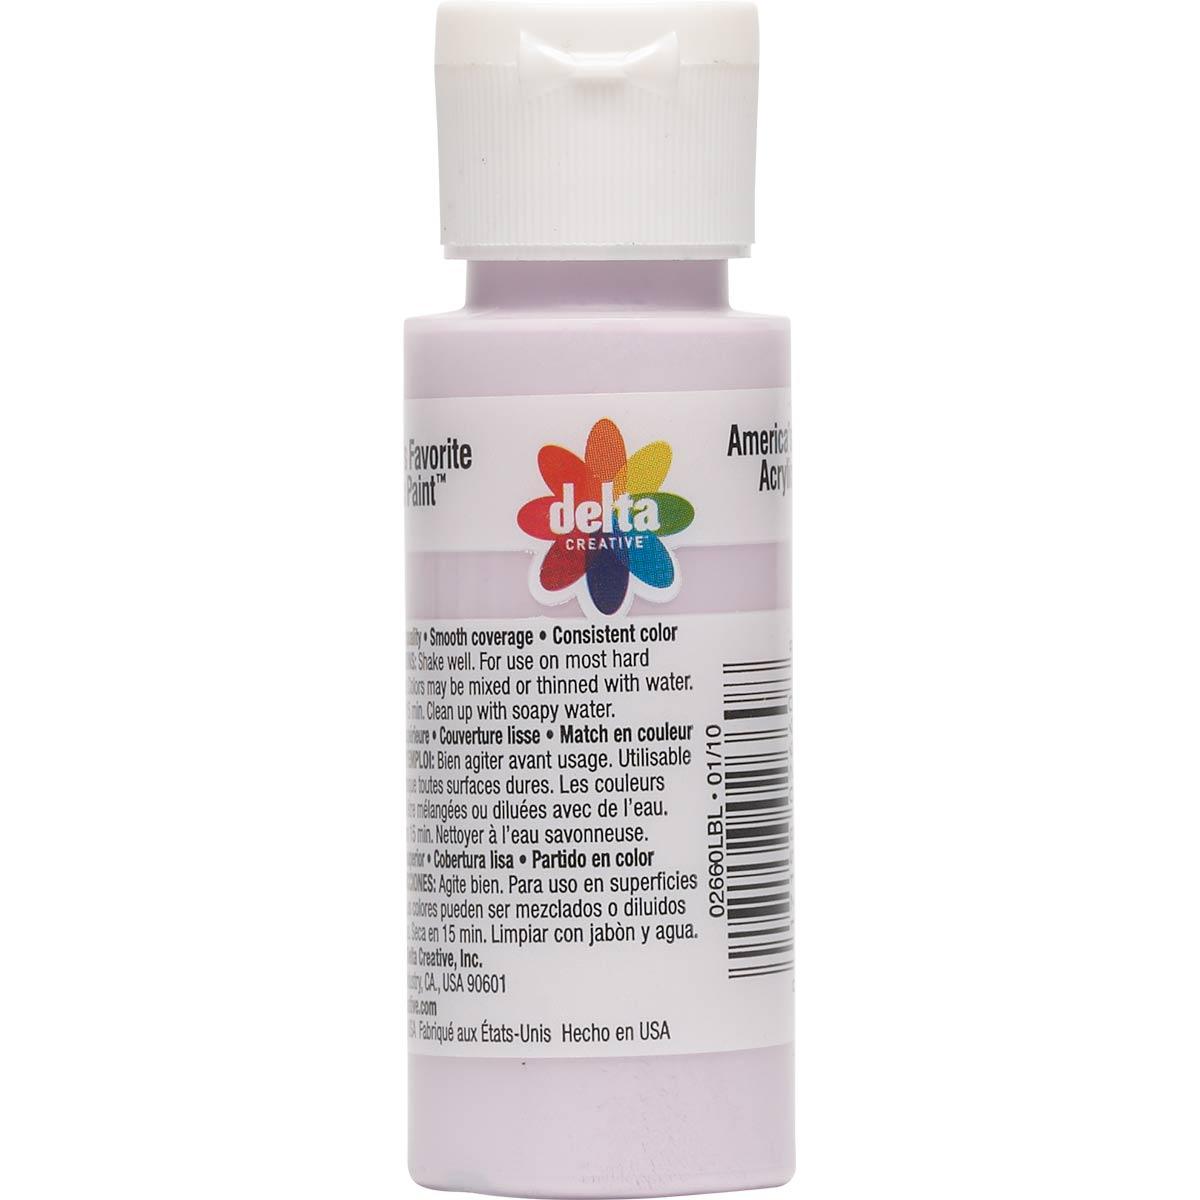 Delta Ceramcoat ® Acrylic Paint - Sweet Pea, 2 oz. - 026600202W